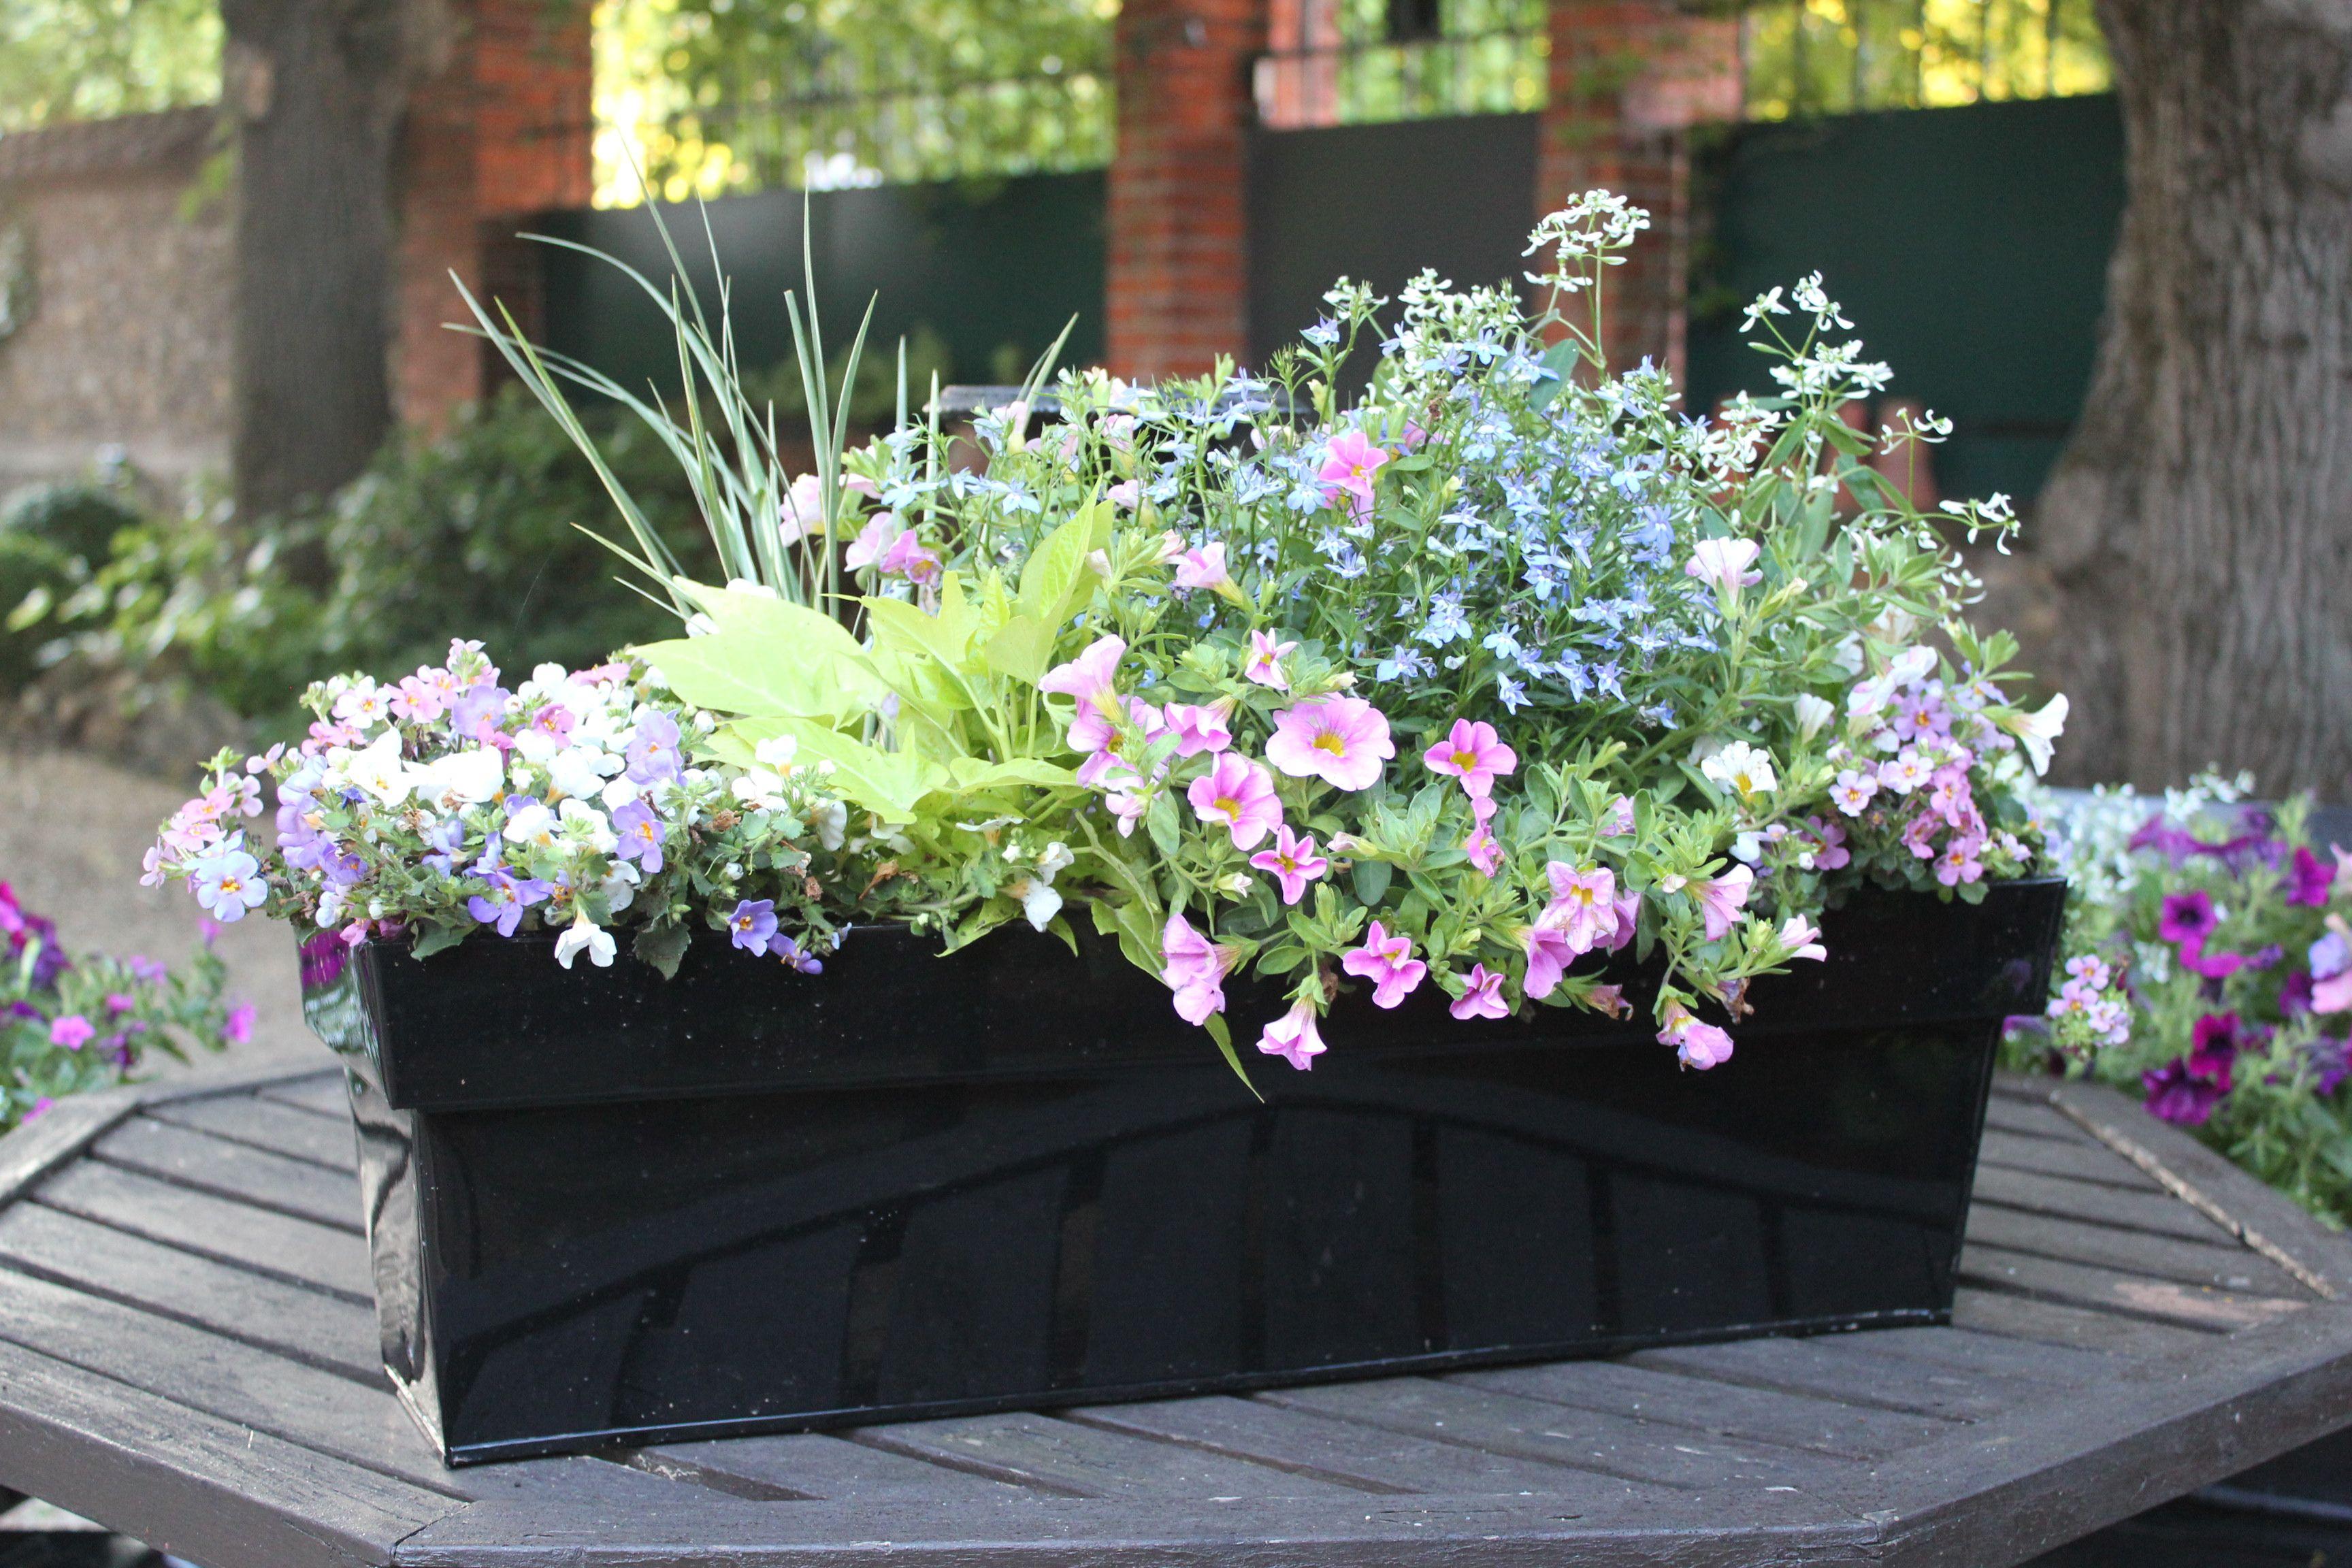 Idee De Jardiniere Une Ide De Jardinire Dans Un Mur En Pierres